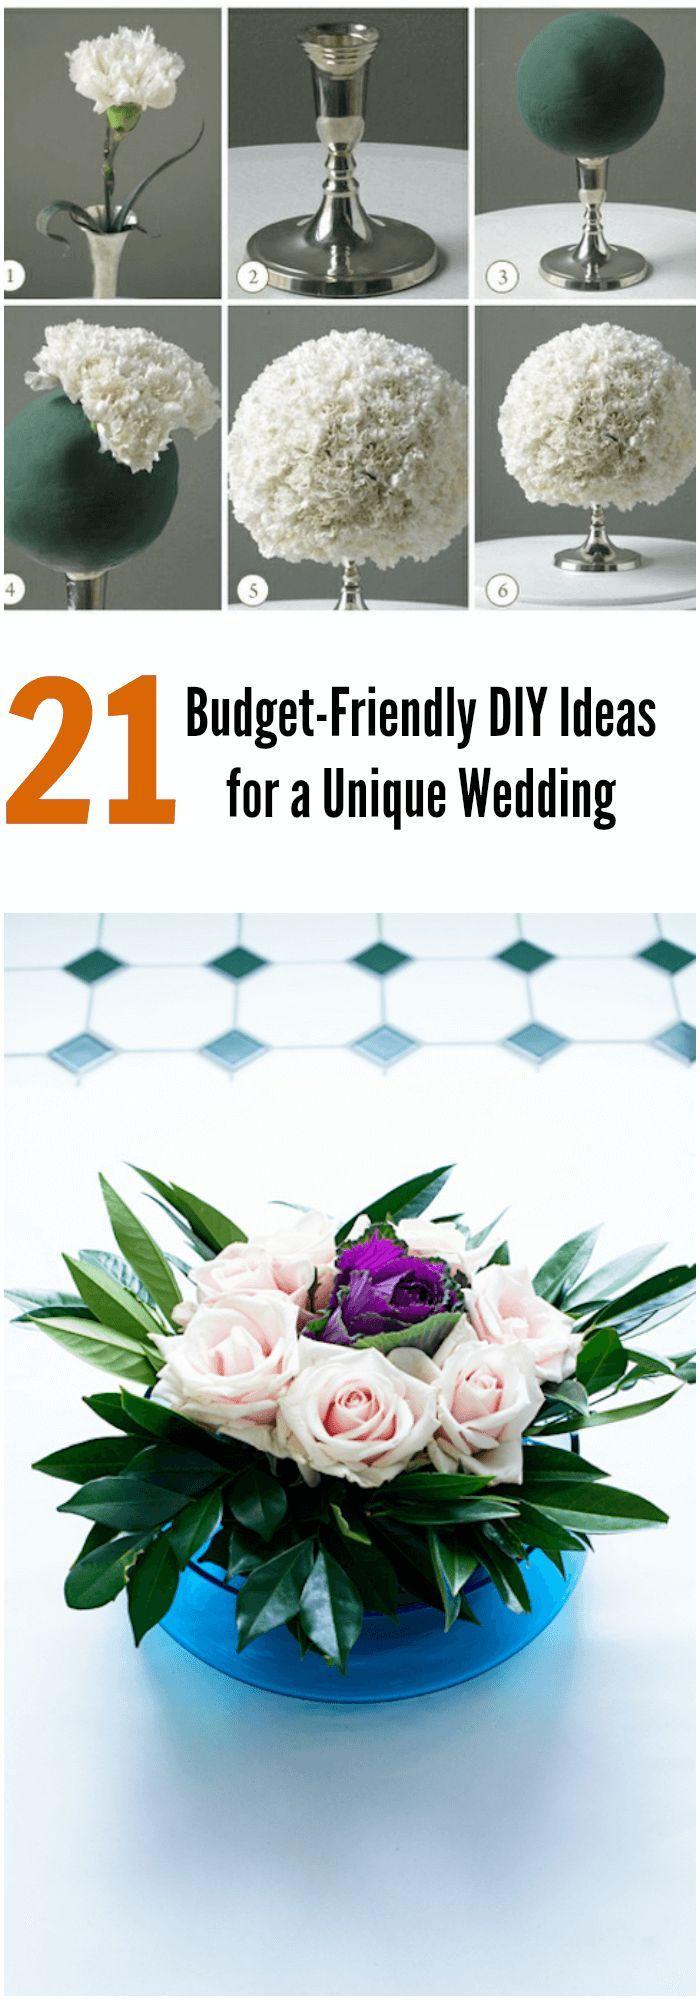 888 best Budget Friendly Wedding Decor images on Pinterest ...